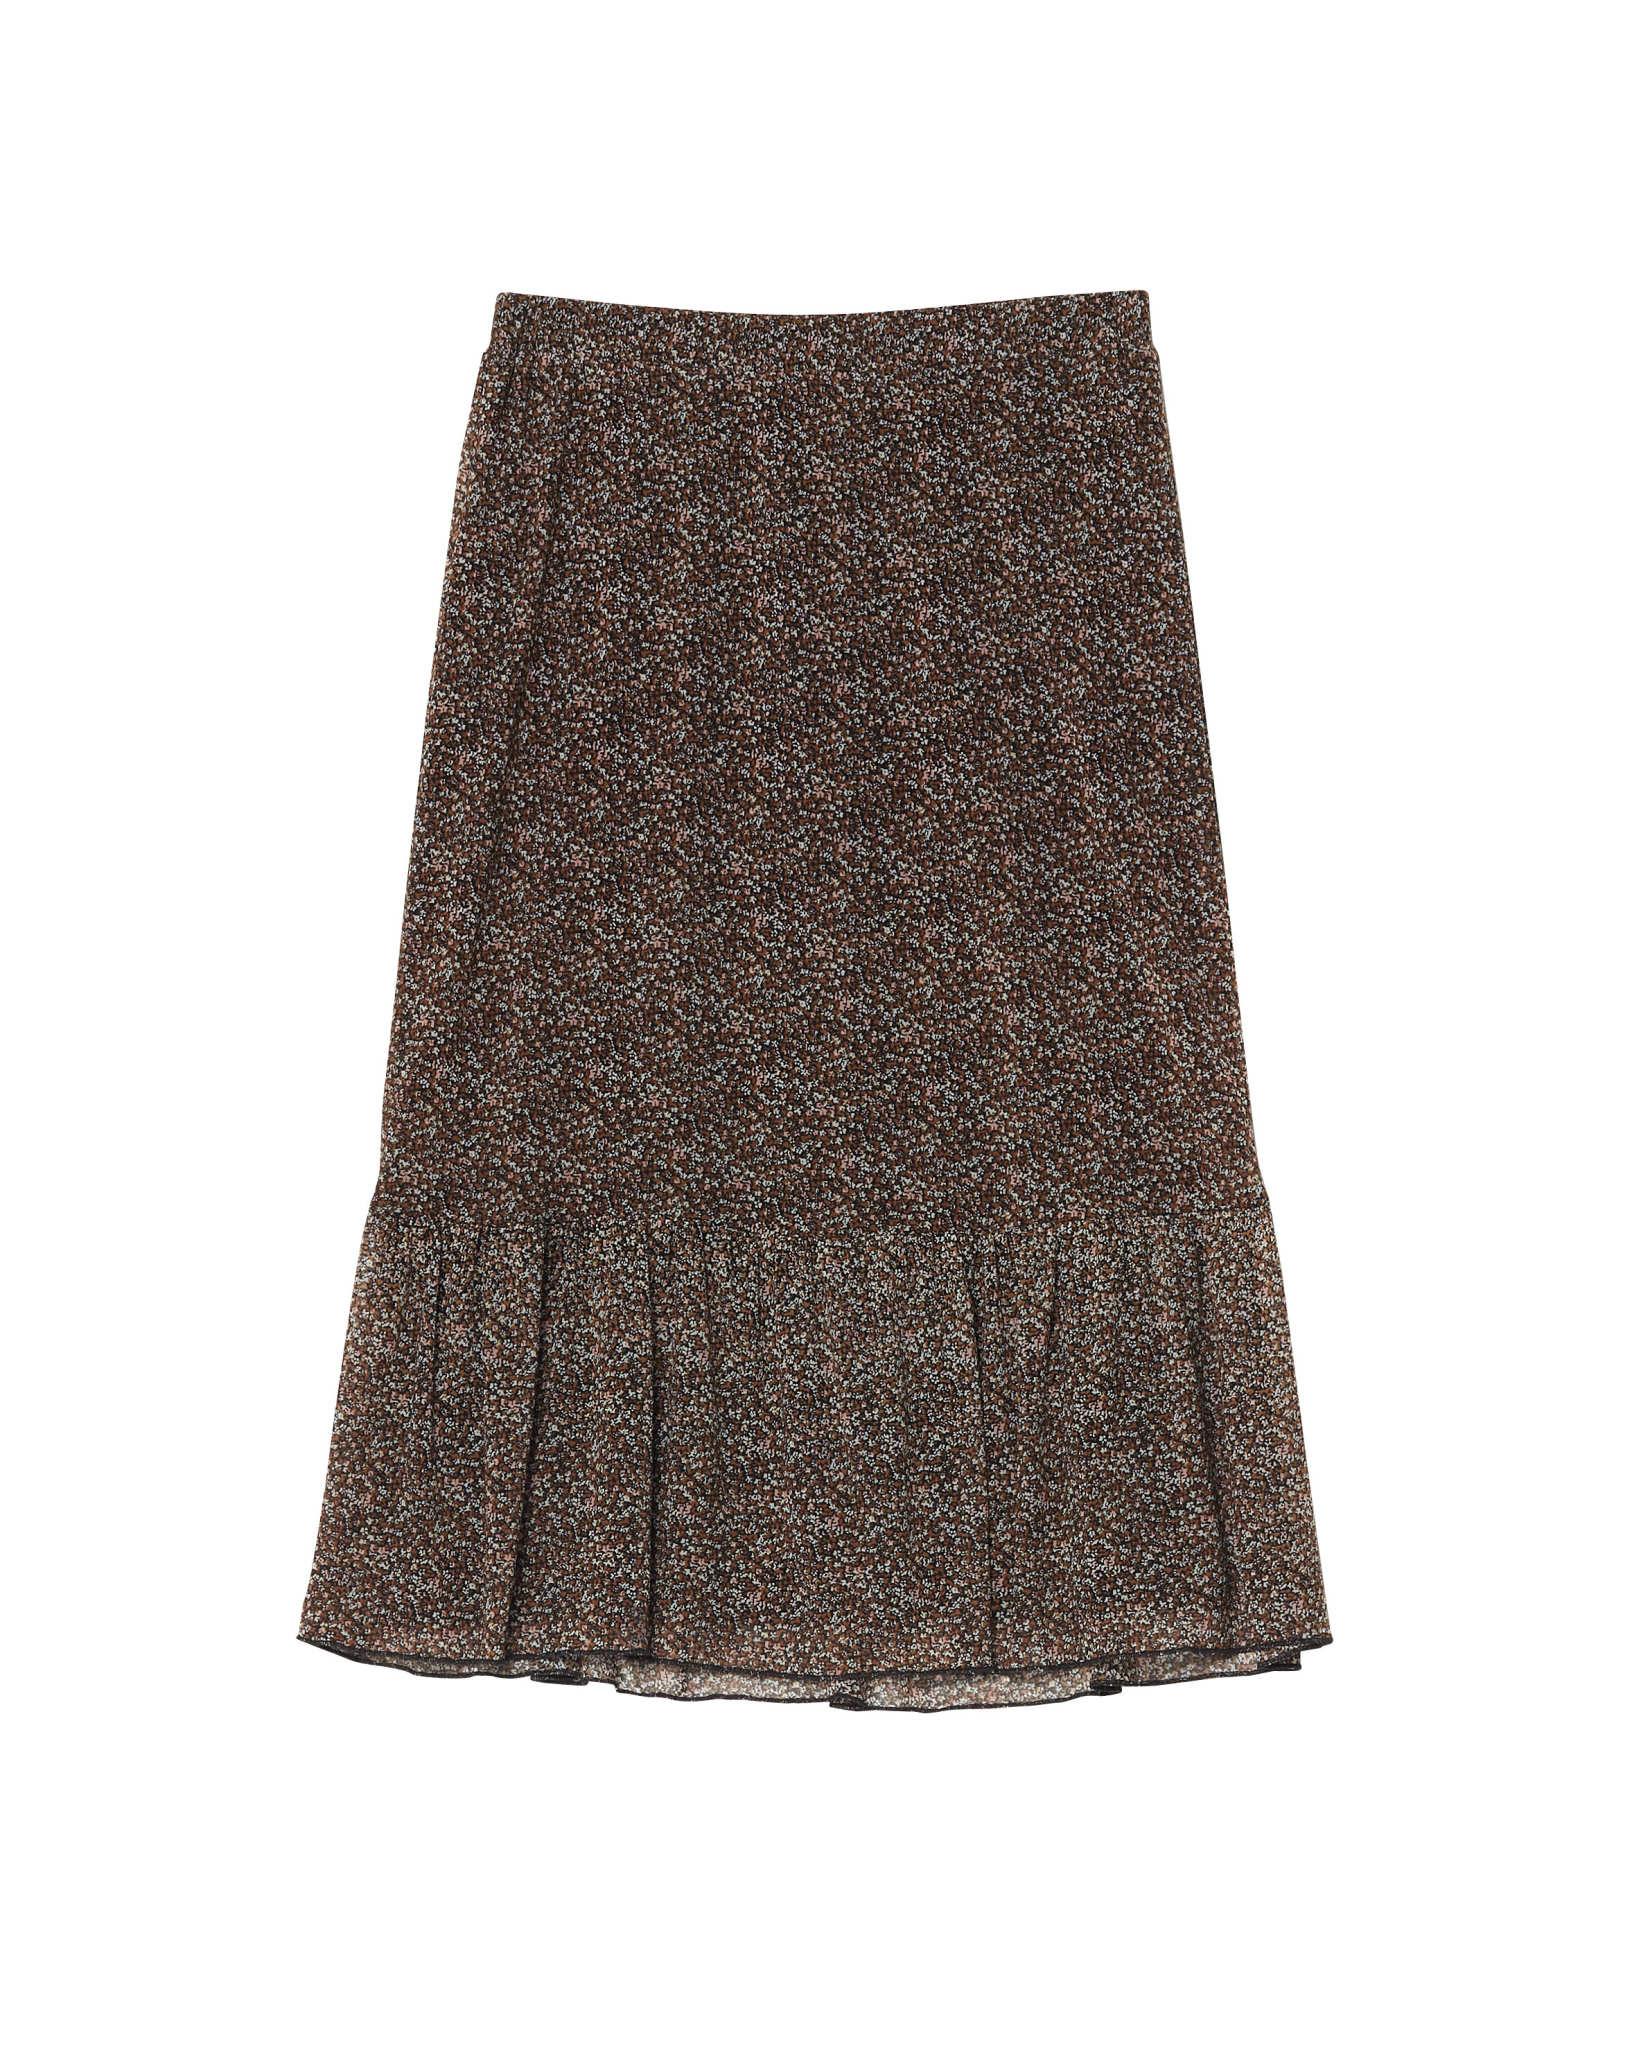 Yerse Carola35 Skirt